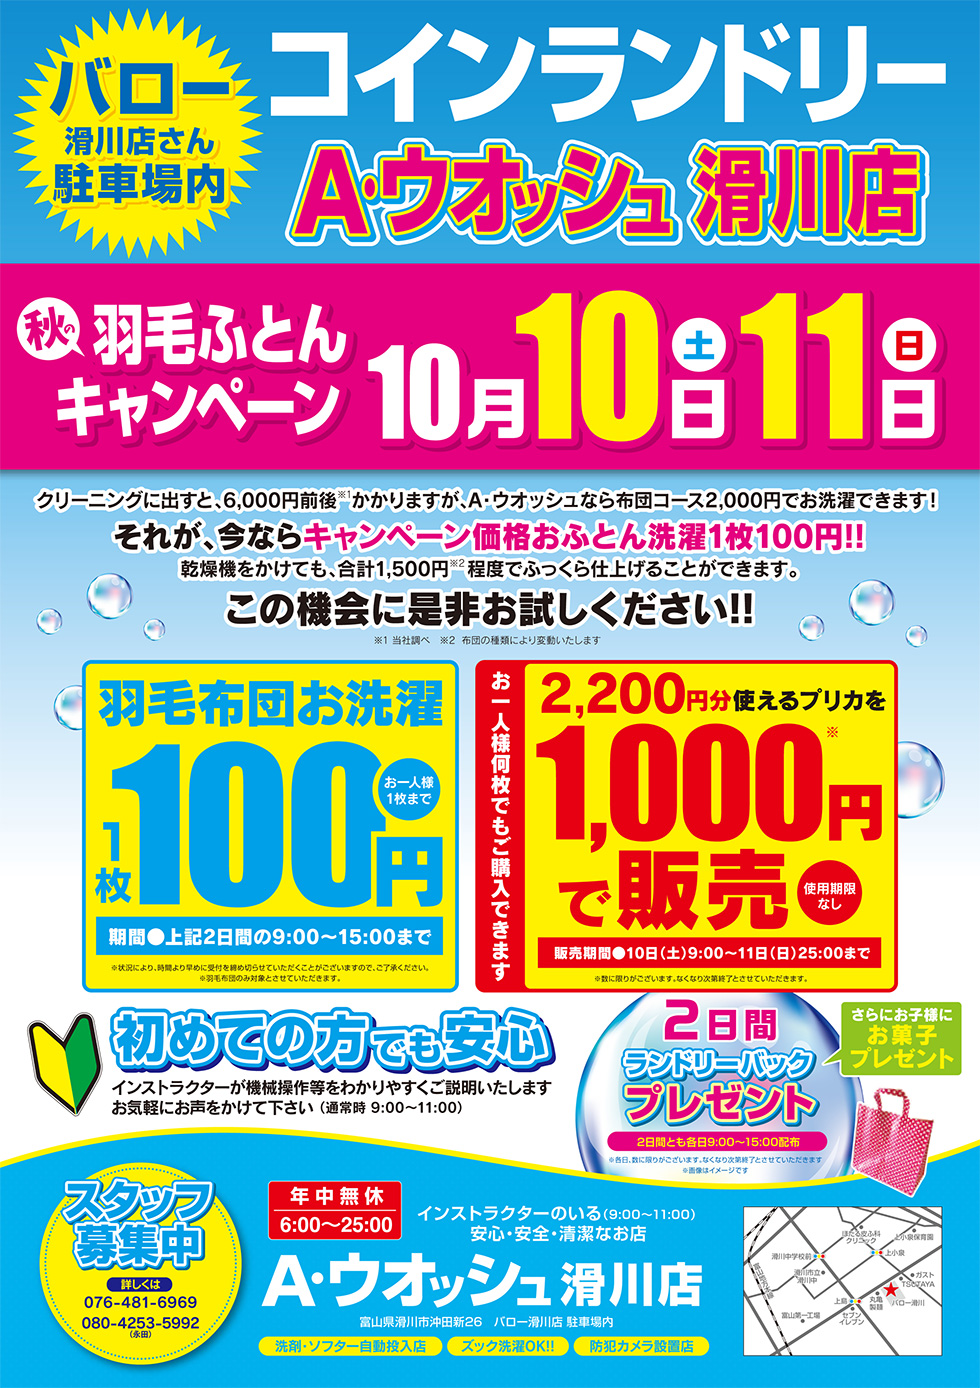 A・ウオッシュ滑川店 秋の羽毛ふとんキャンペーン